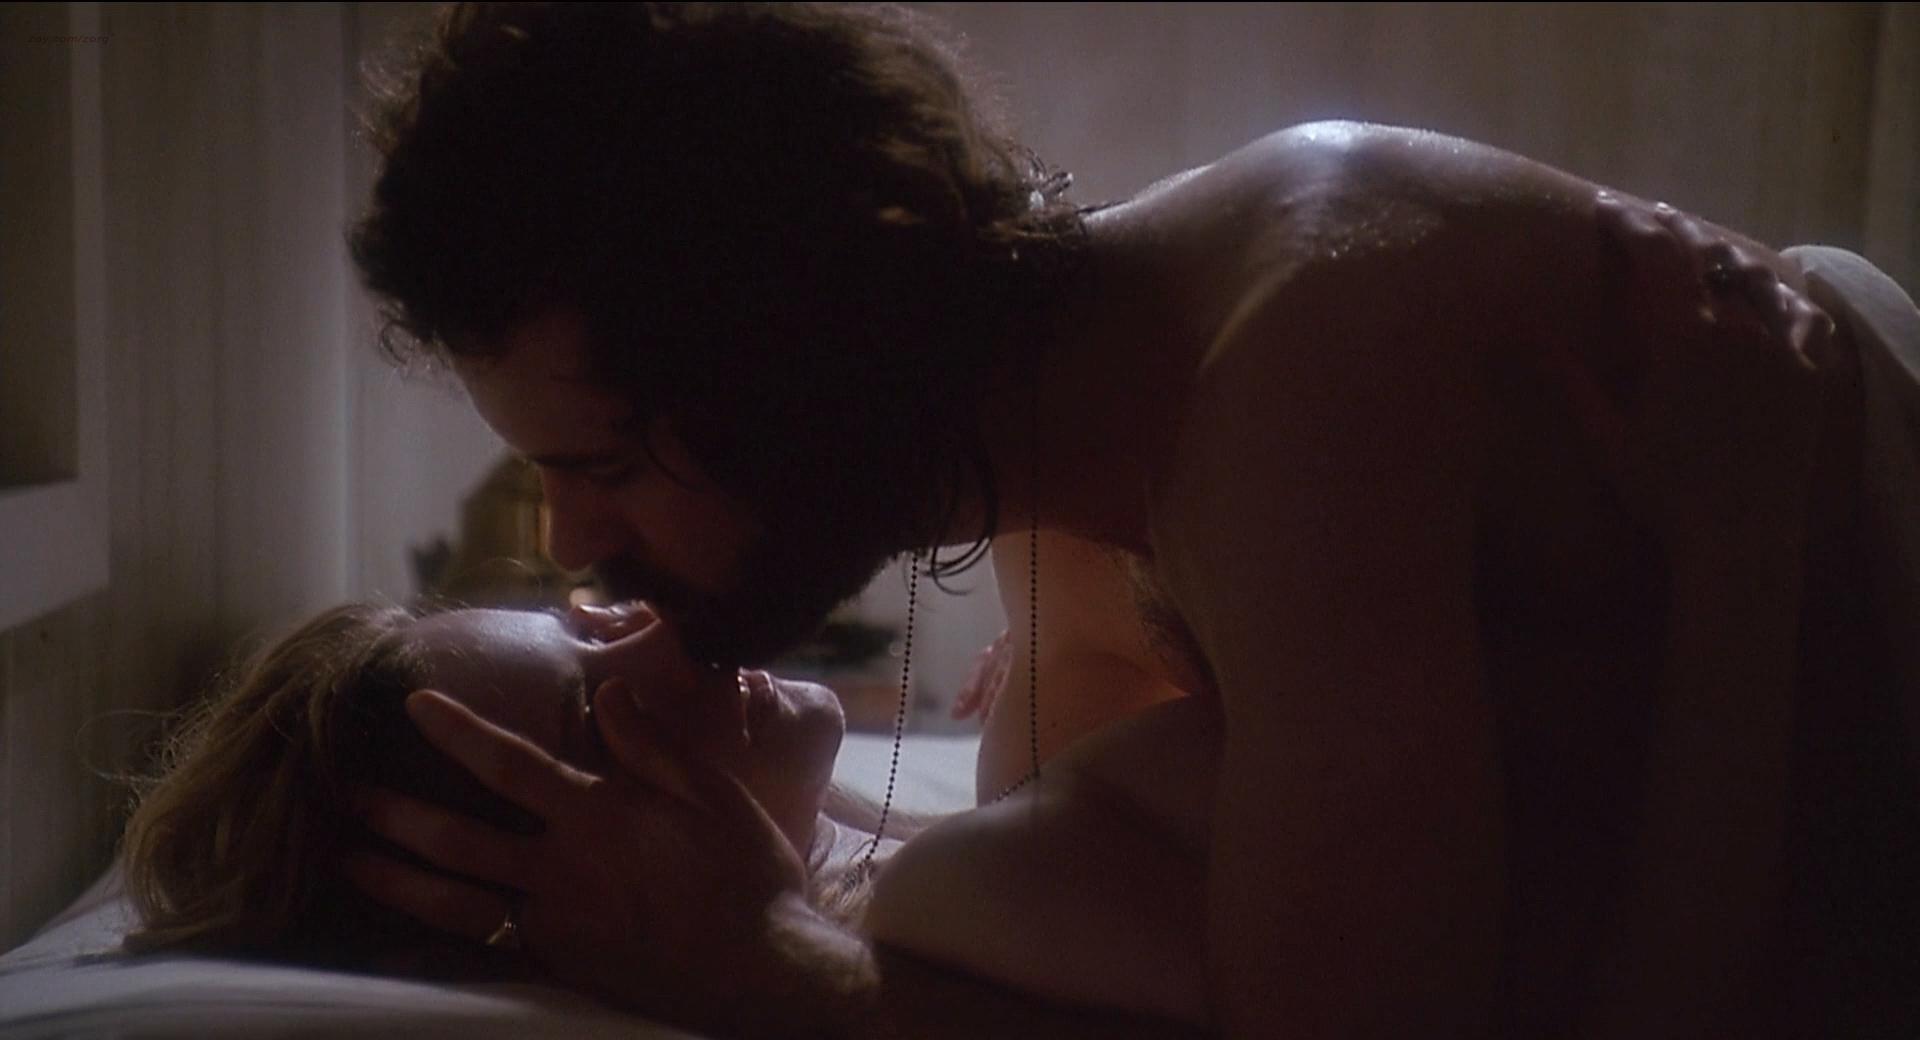 jennifer jason leigh nipple